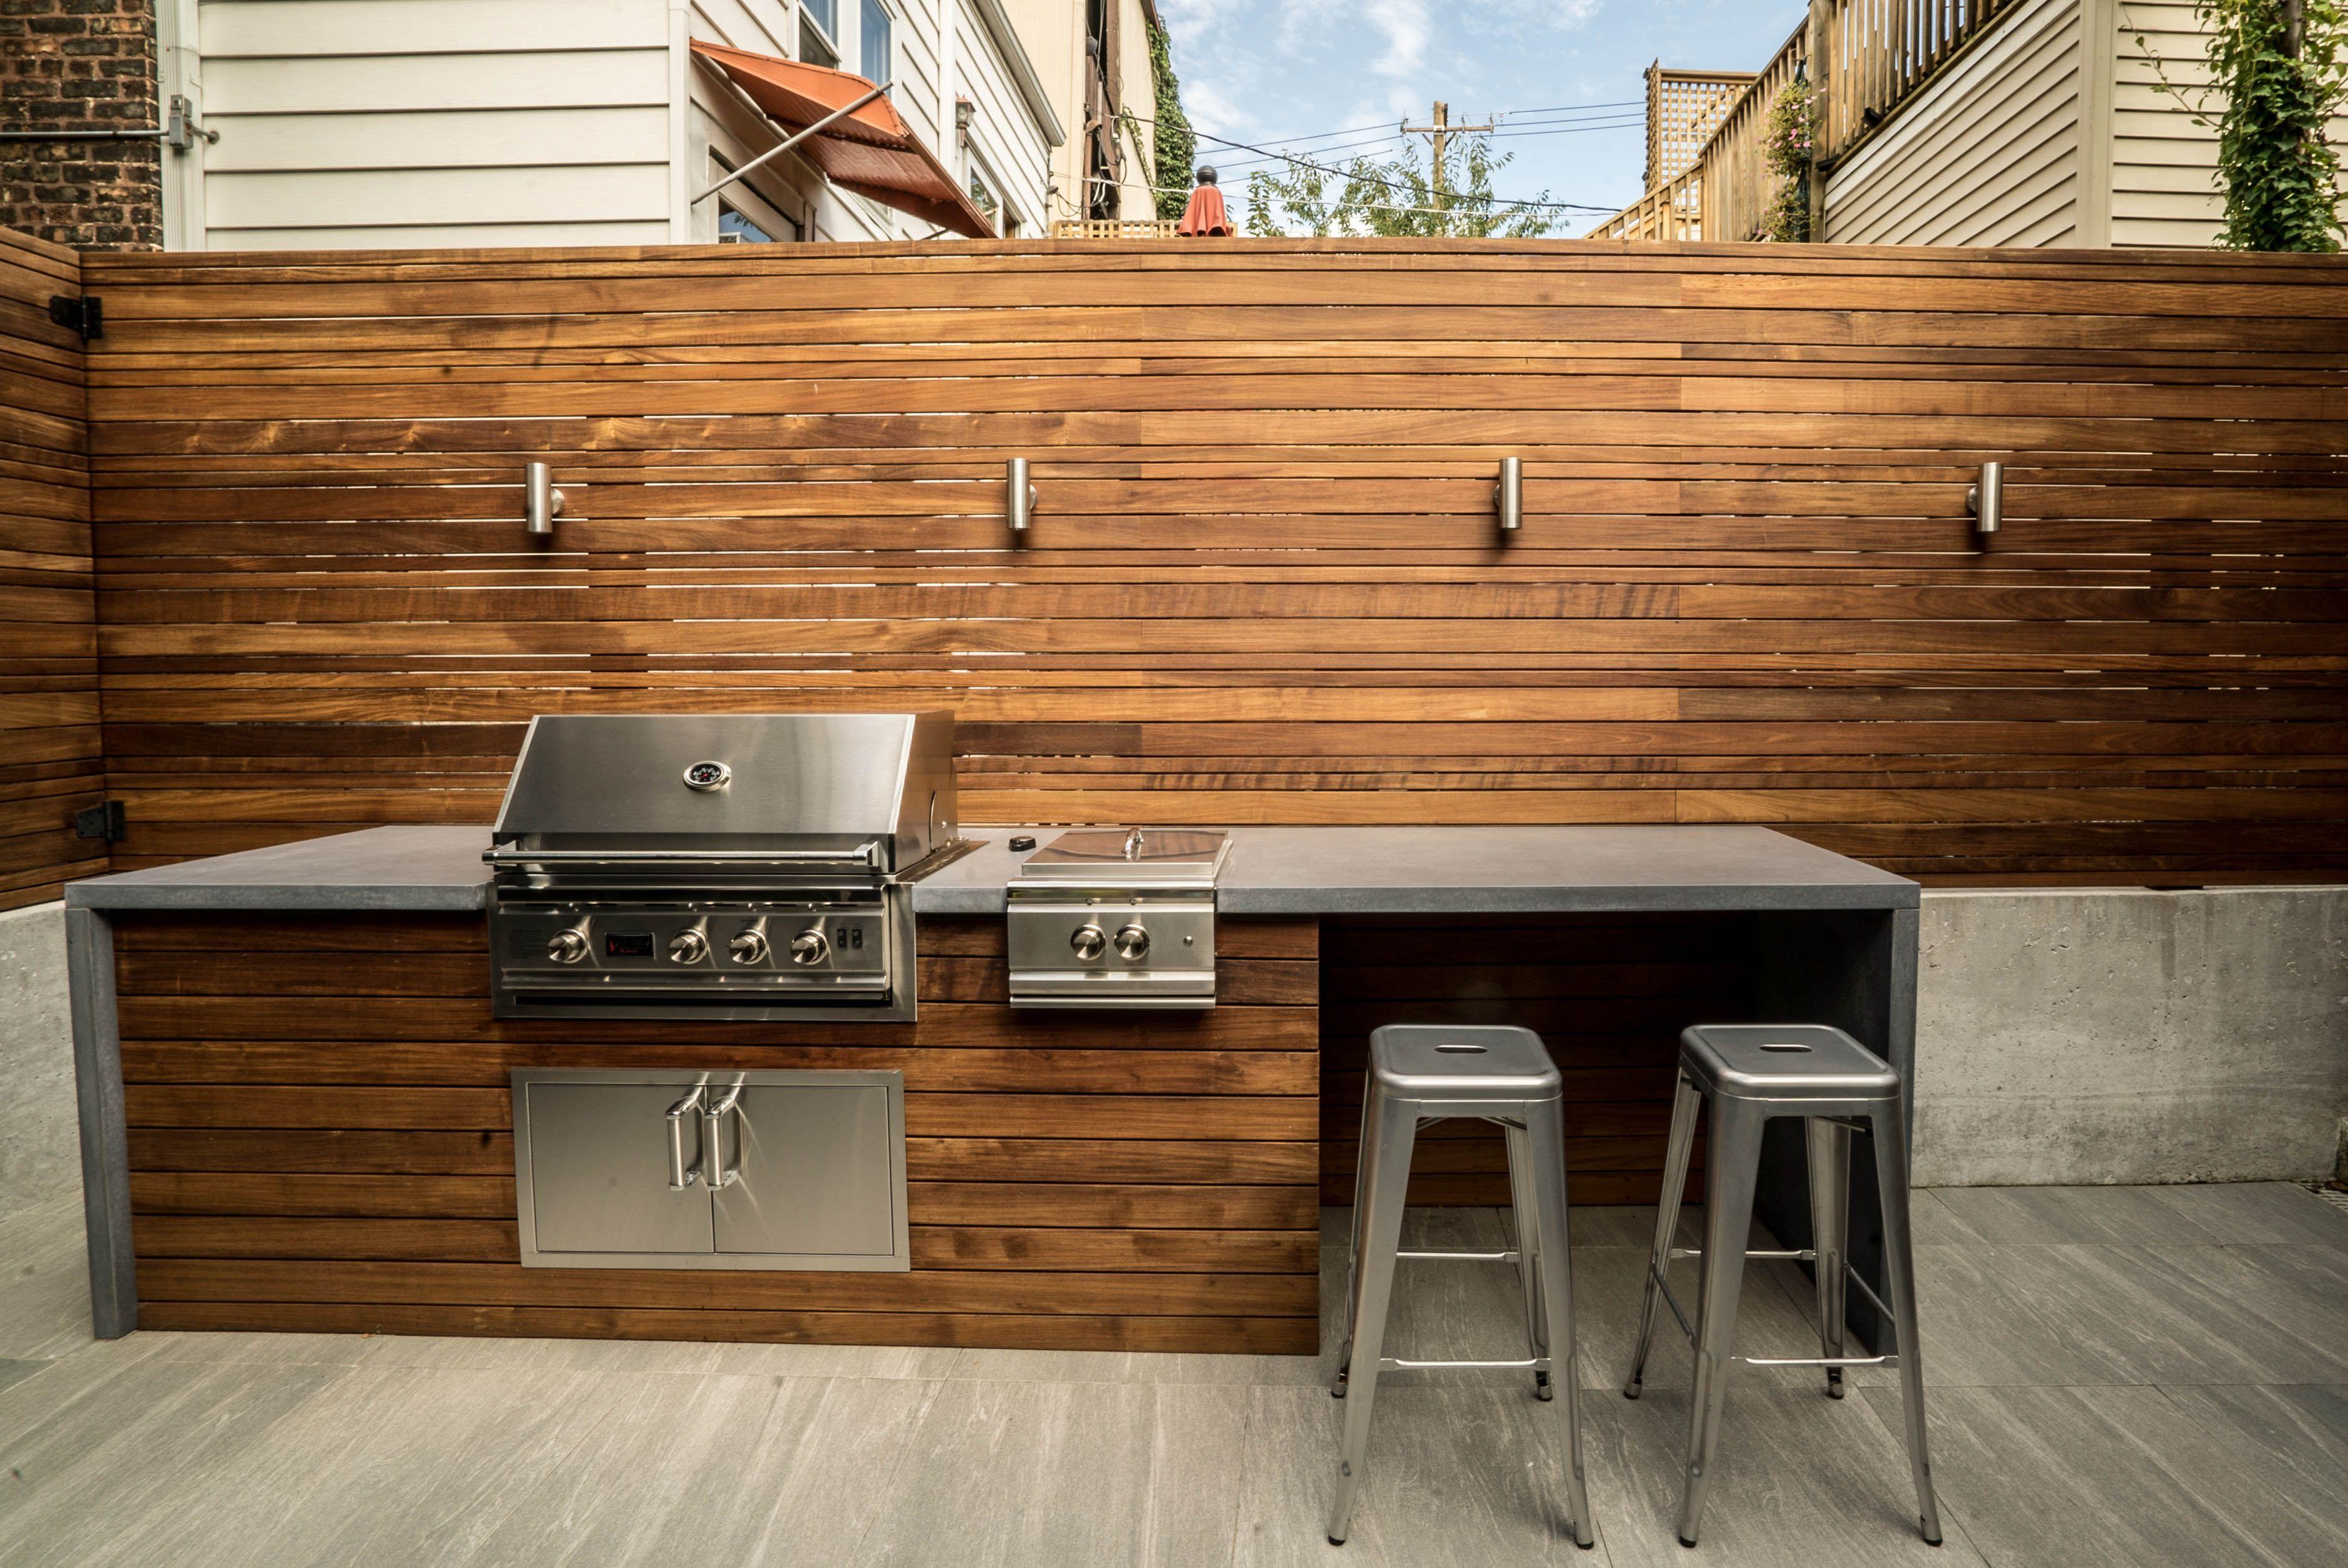 Ipe fence custom fence concrete retaining wall outdoor